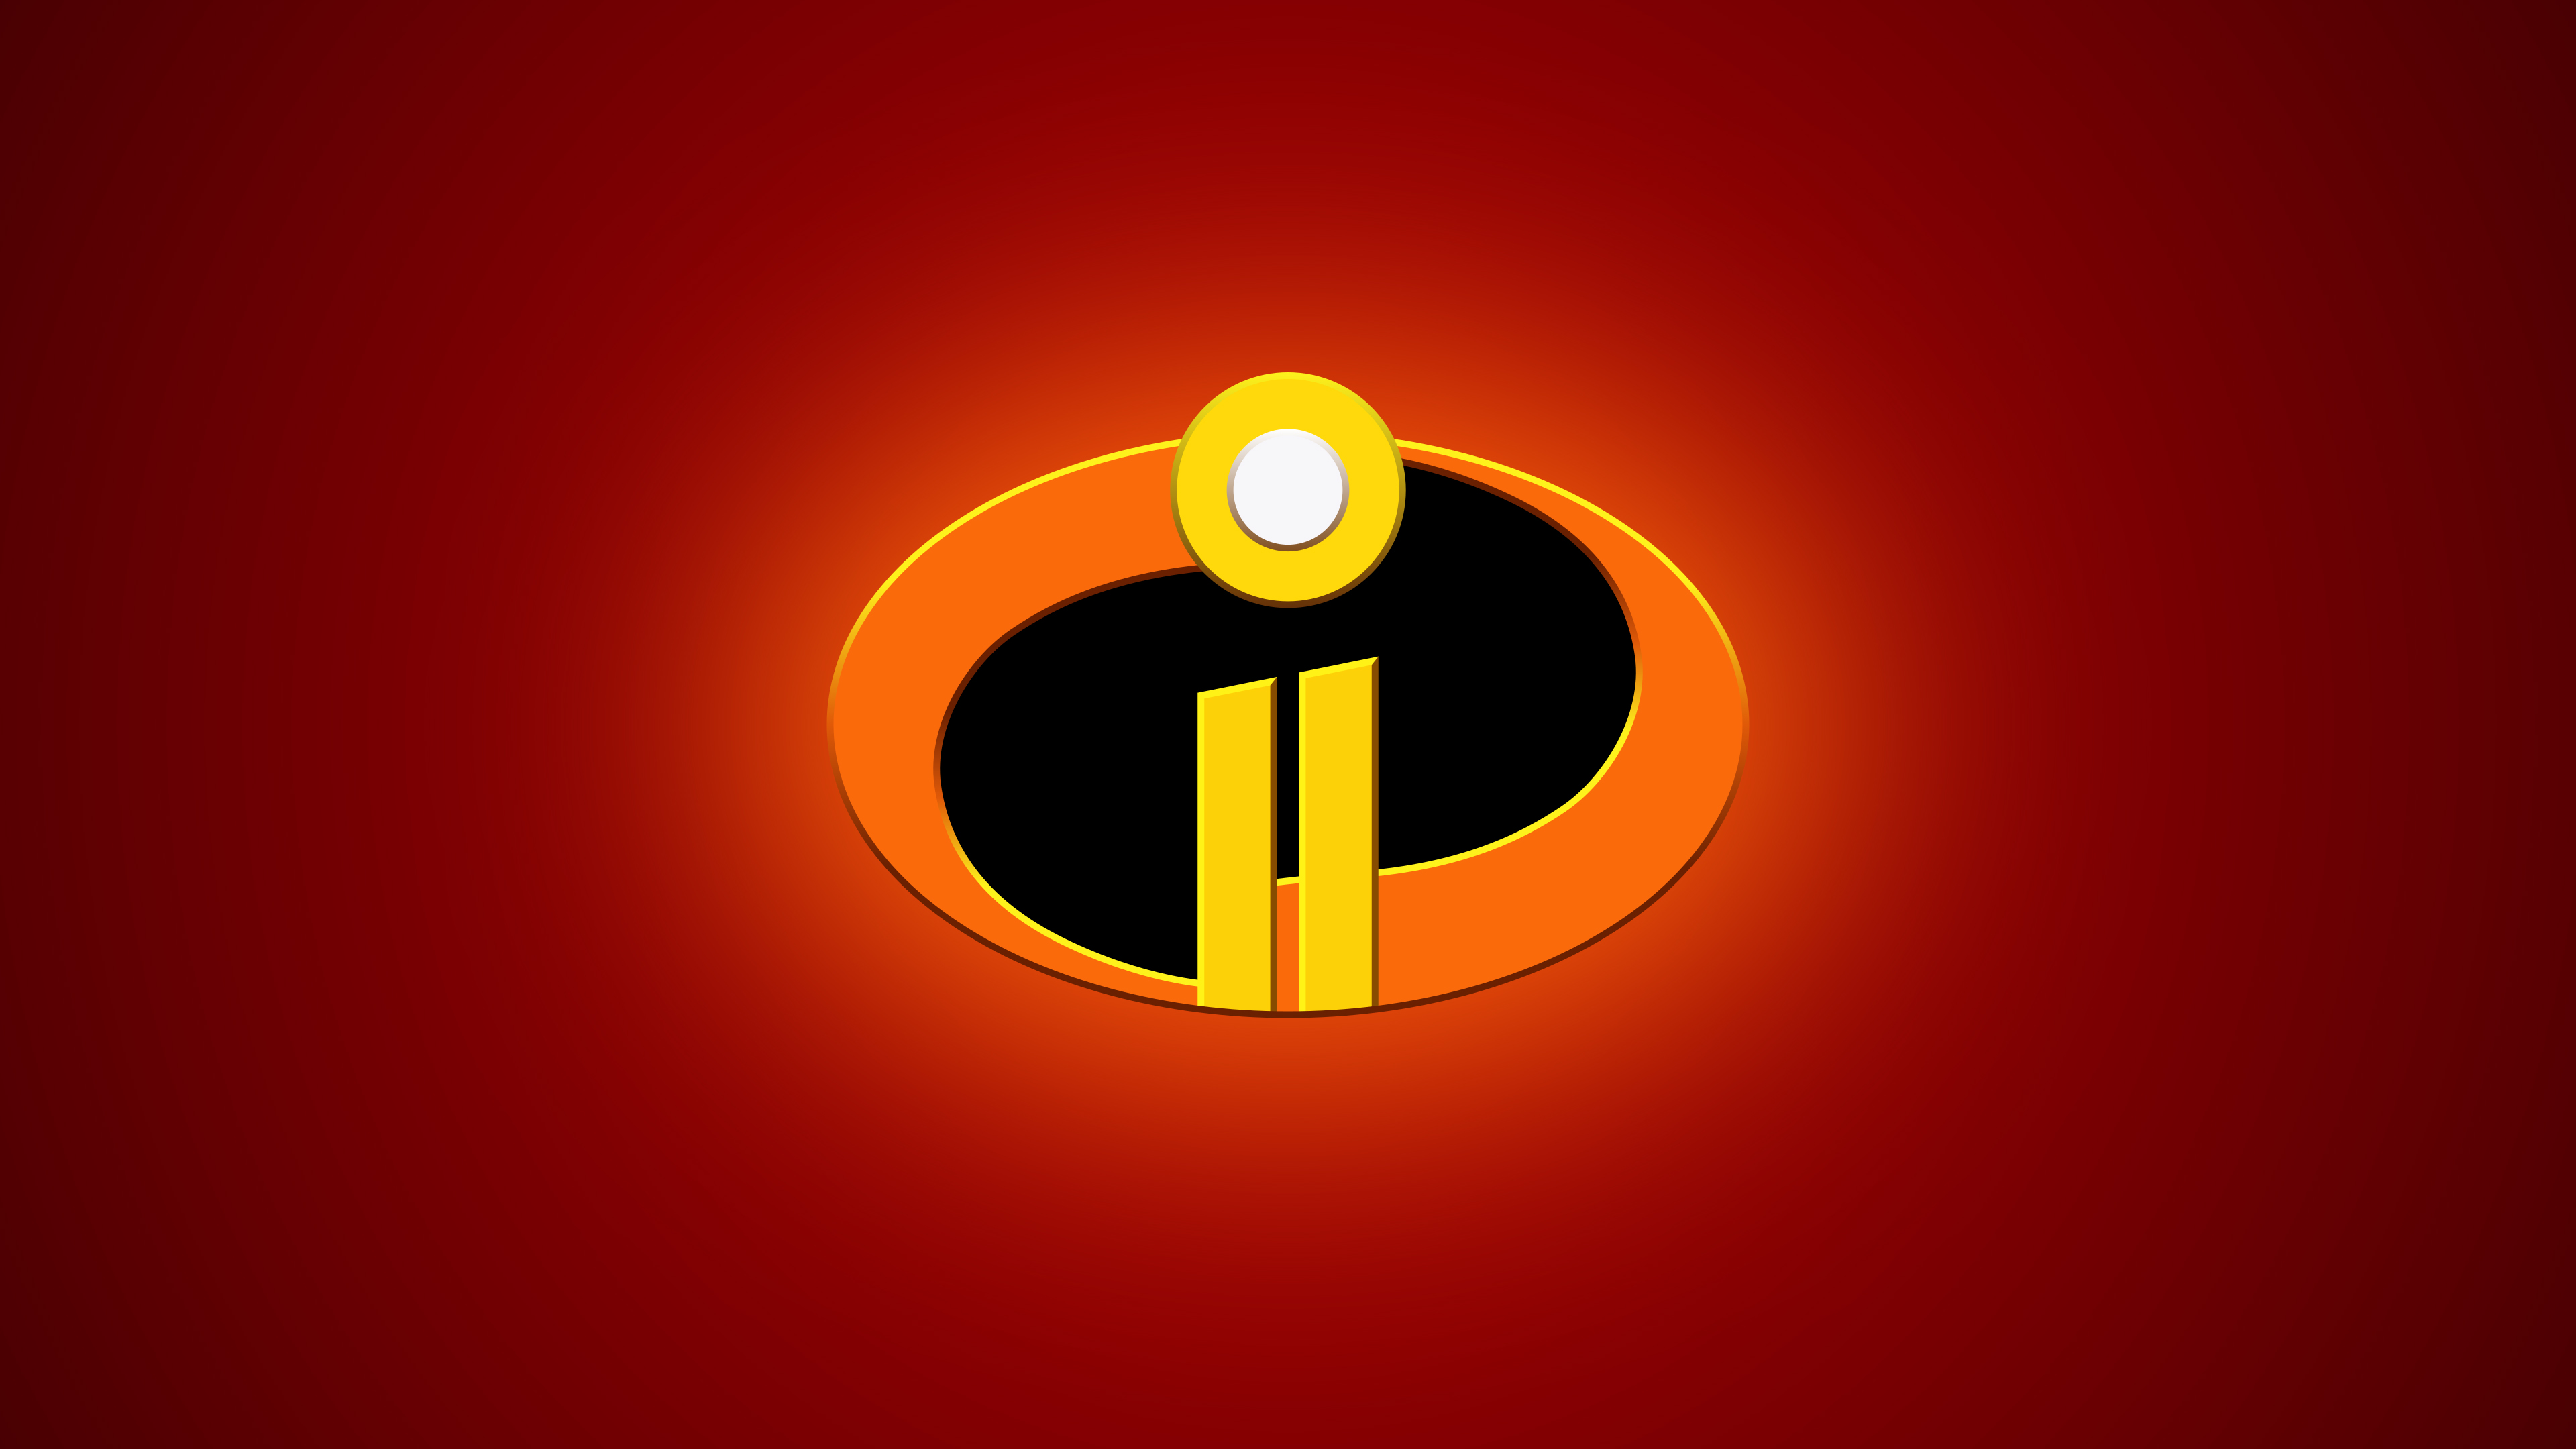 Incredible Ii Wallpaper Free: The Incredibles 2 Logo 4k, HD Movies, 4k Wallpapers